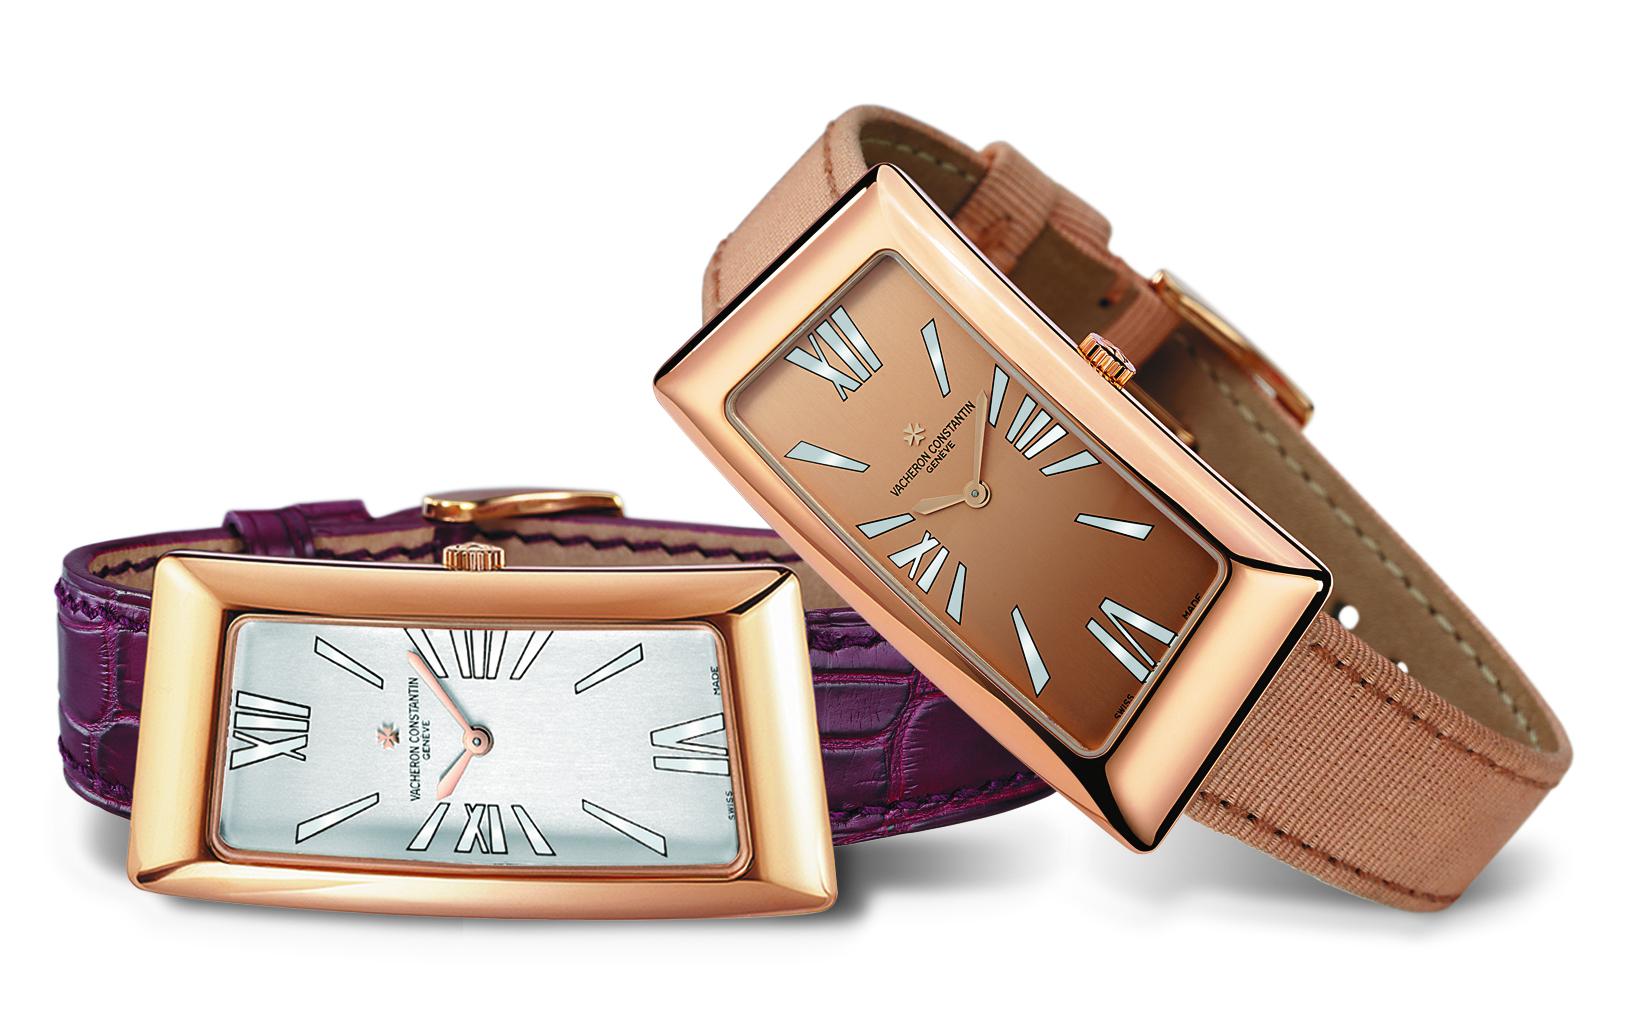 Vacheron constantin overseas d vacheron constantin malte malt мужские часы в корпусе из розового золота 18 карат.